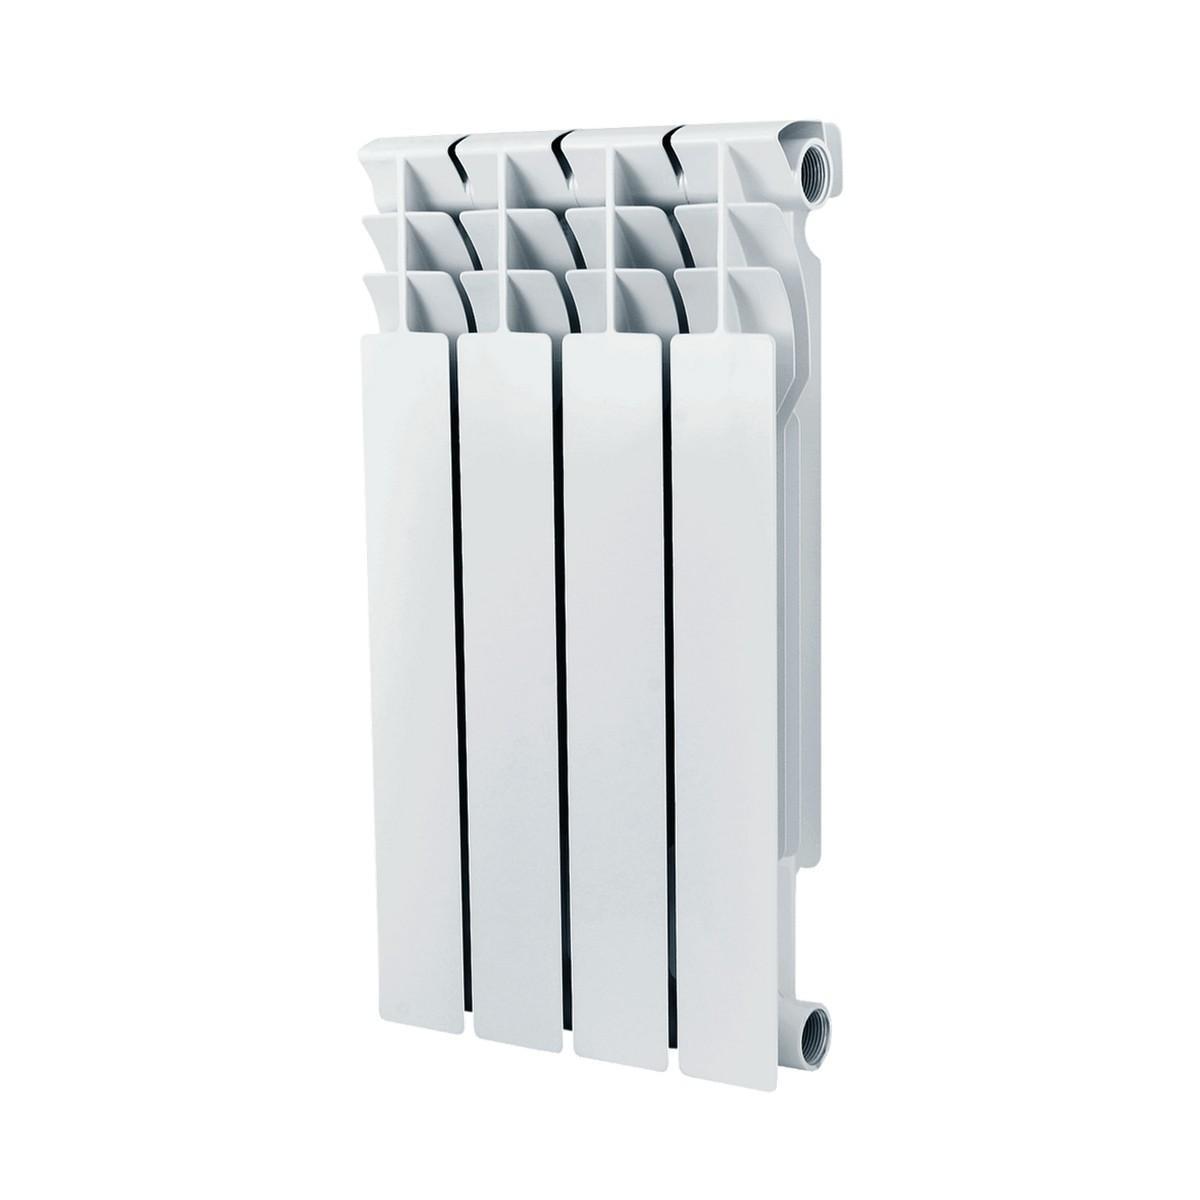 Радиатор биметалл Ultra Plus 350 5 секций Ogint  117-5981